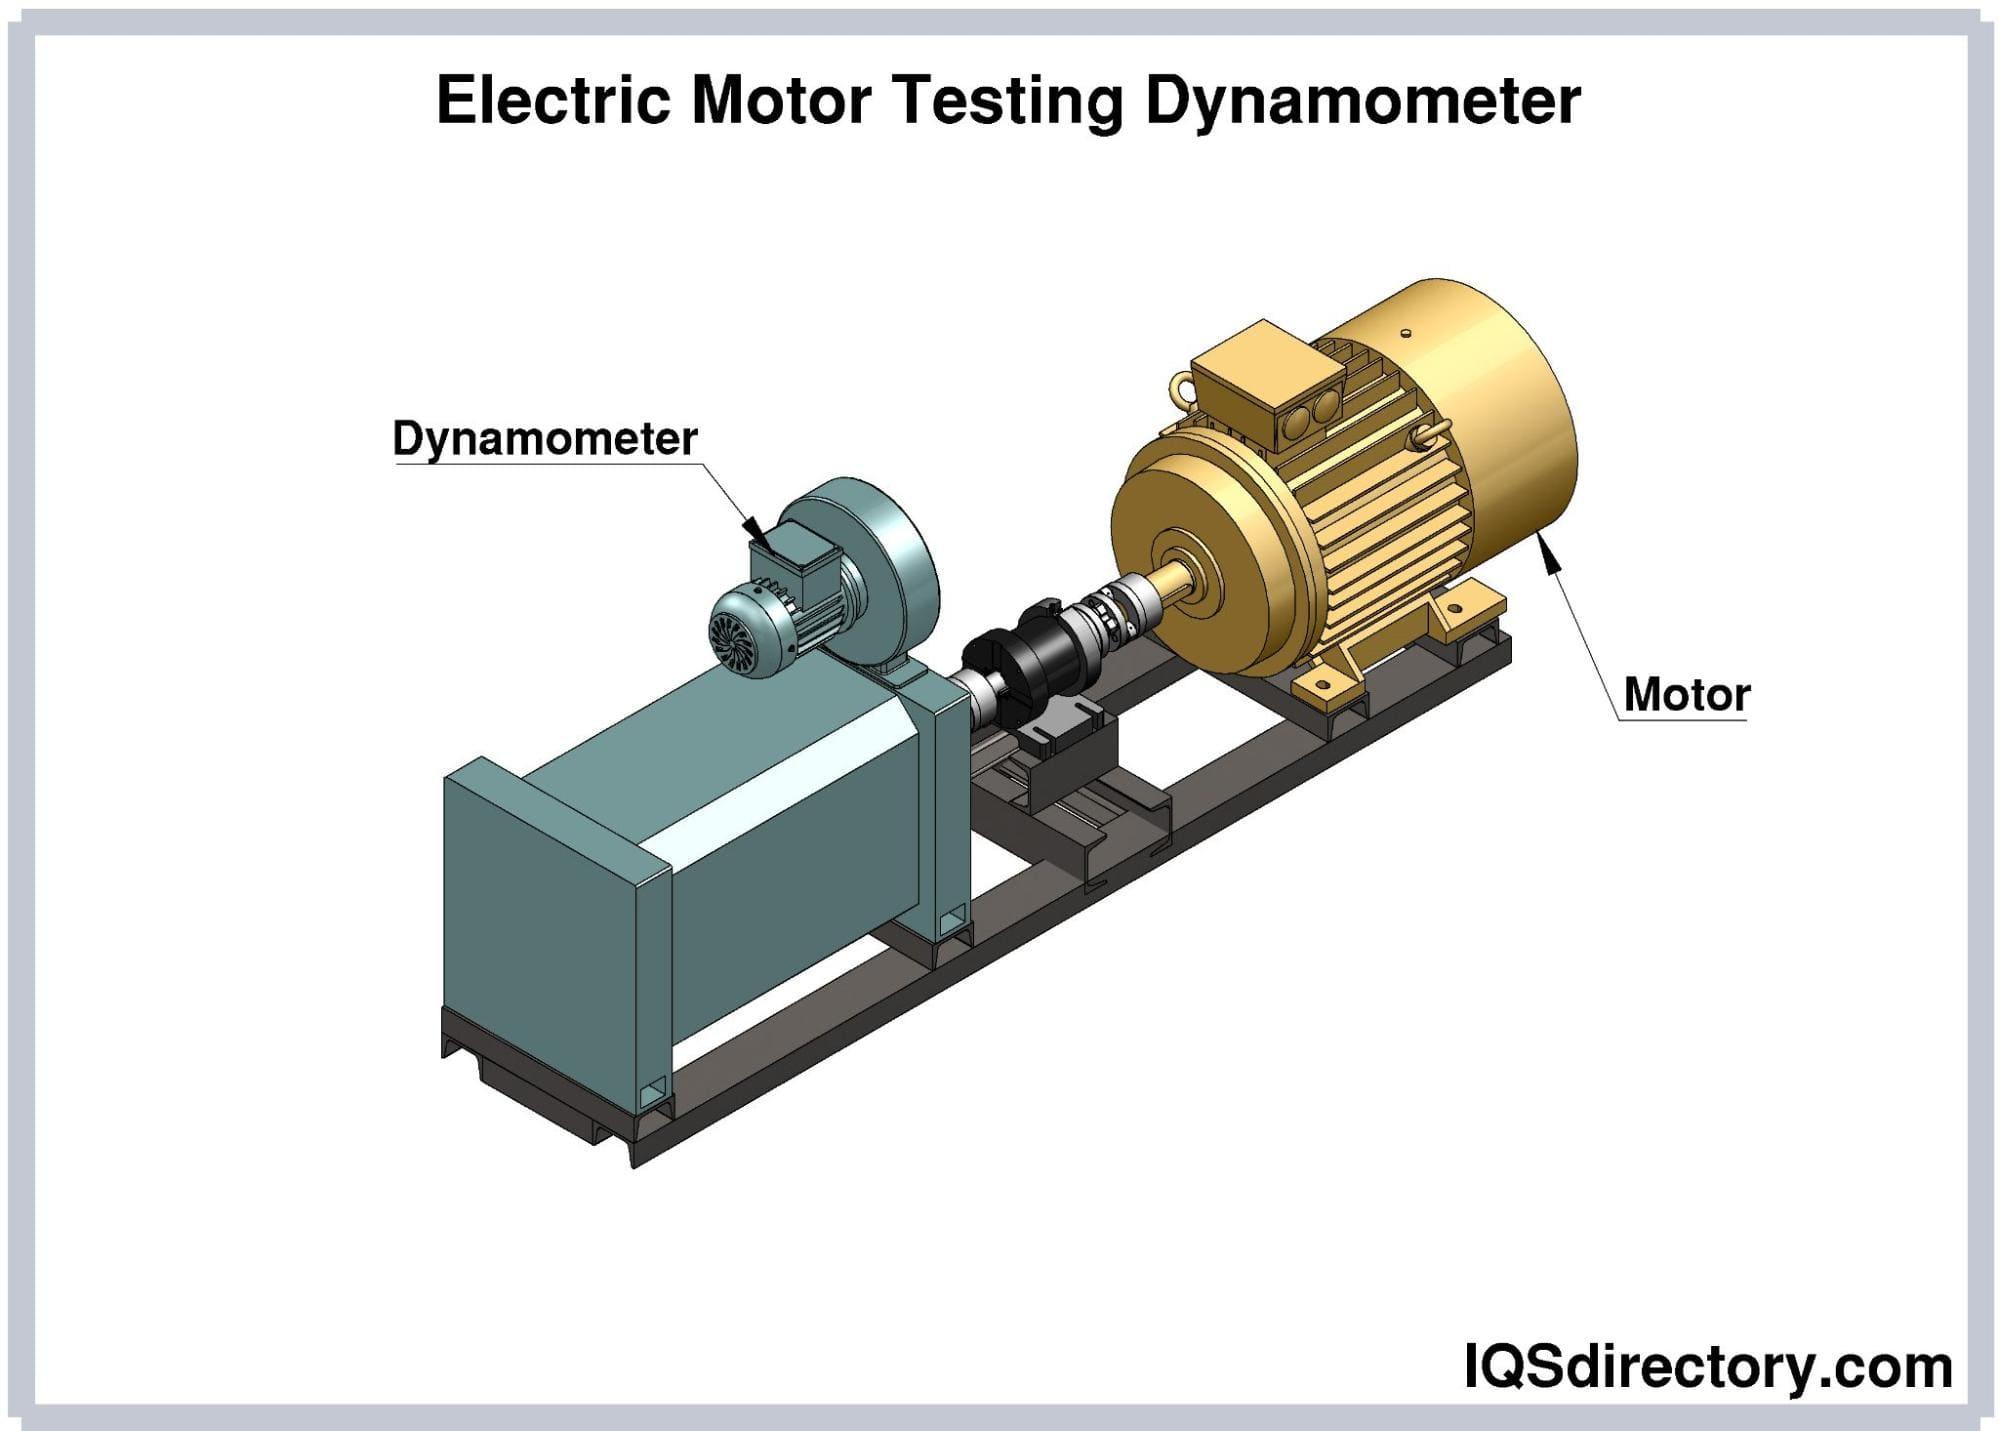 Electric Motor Testing Dynamometer